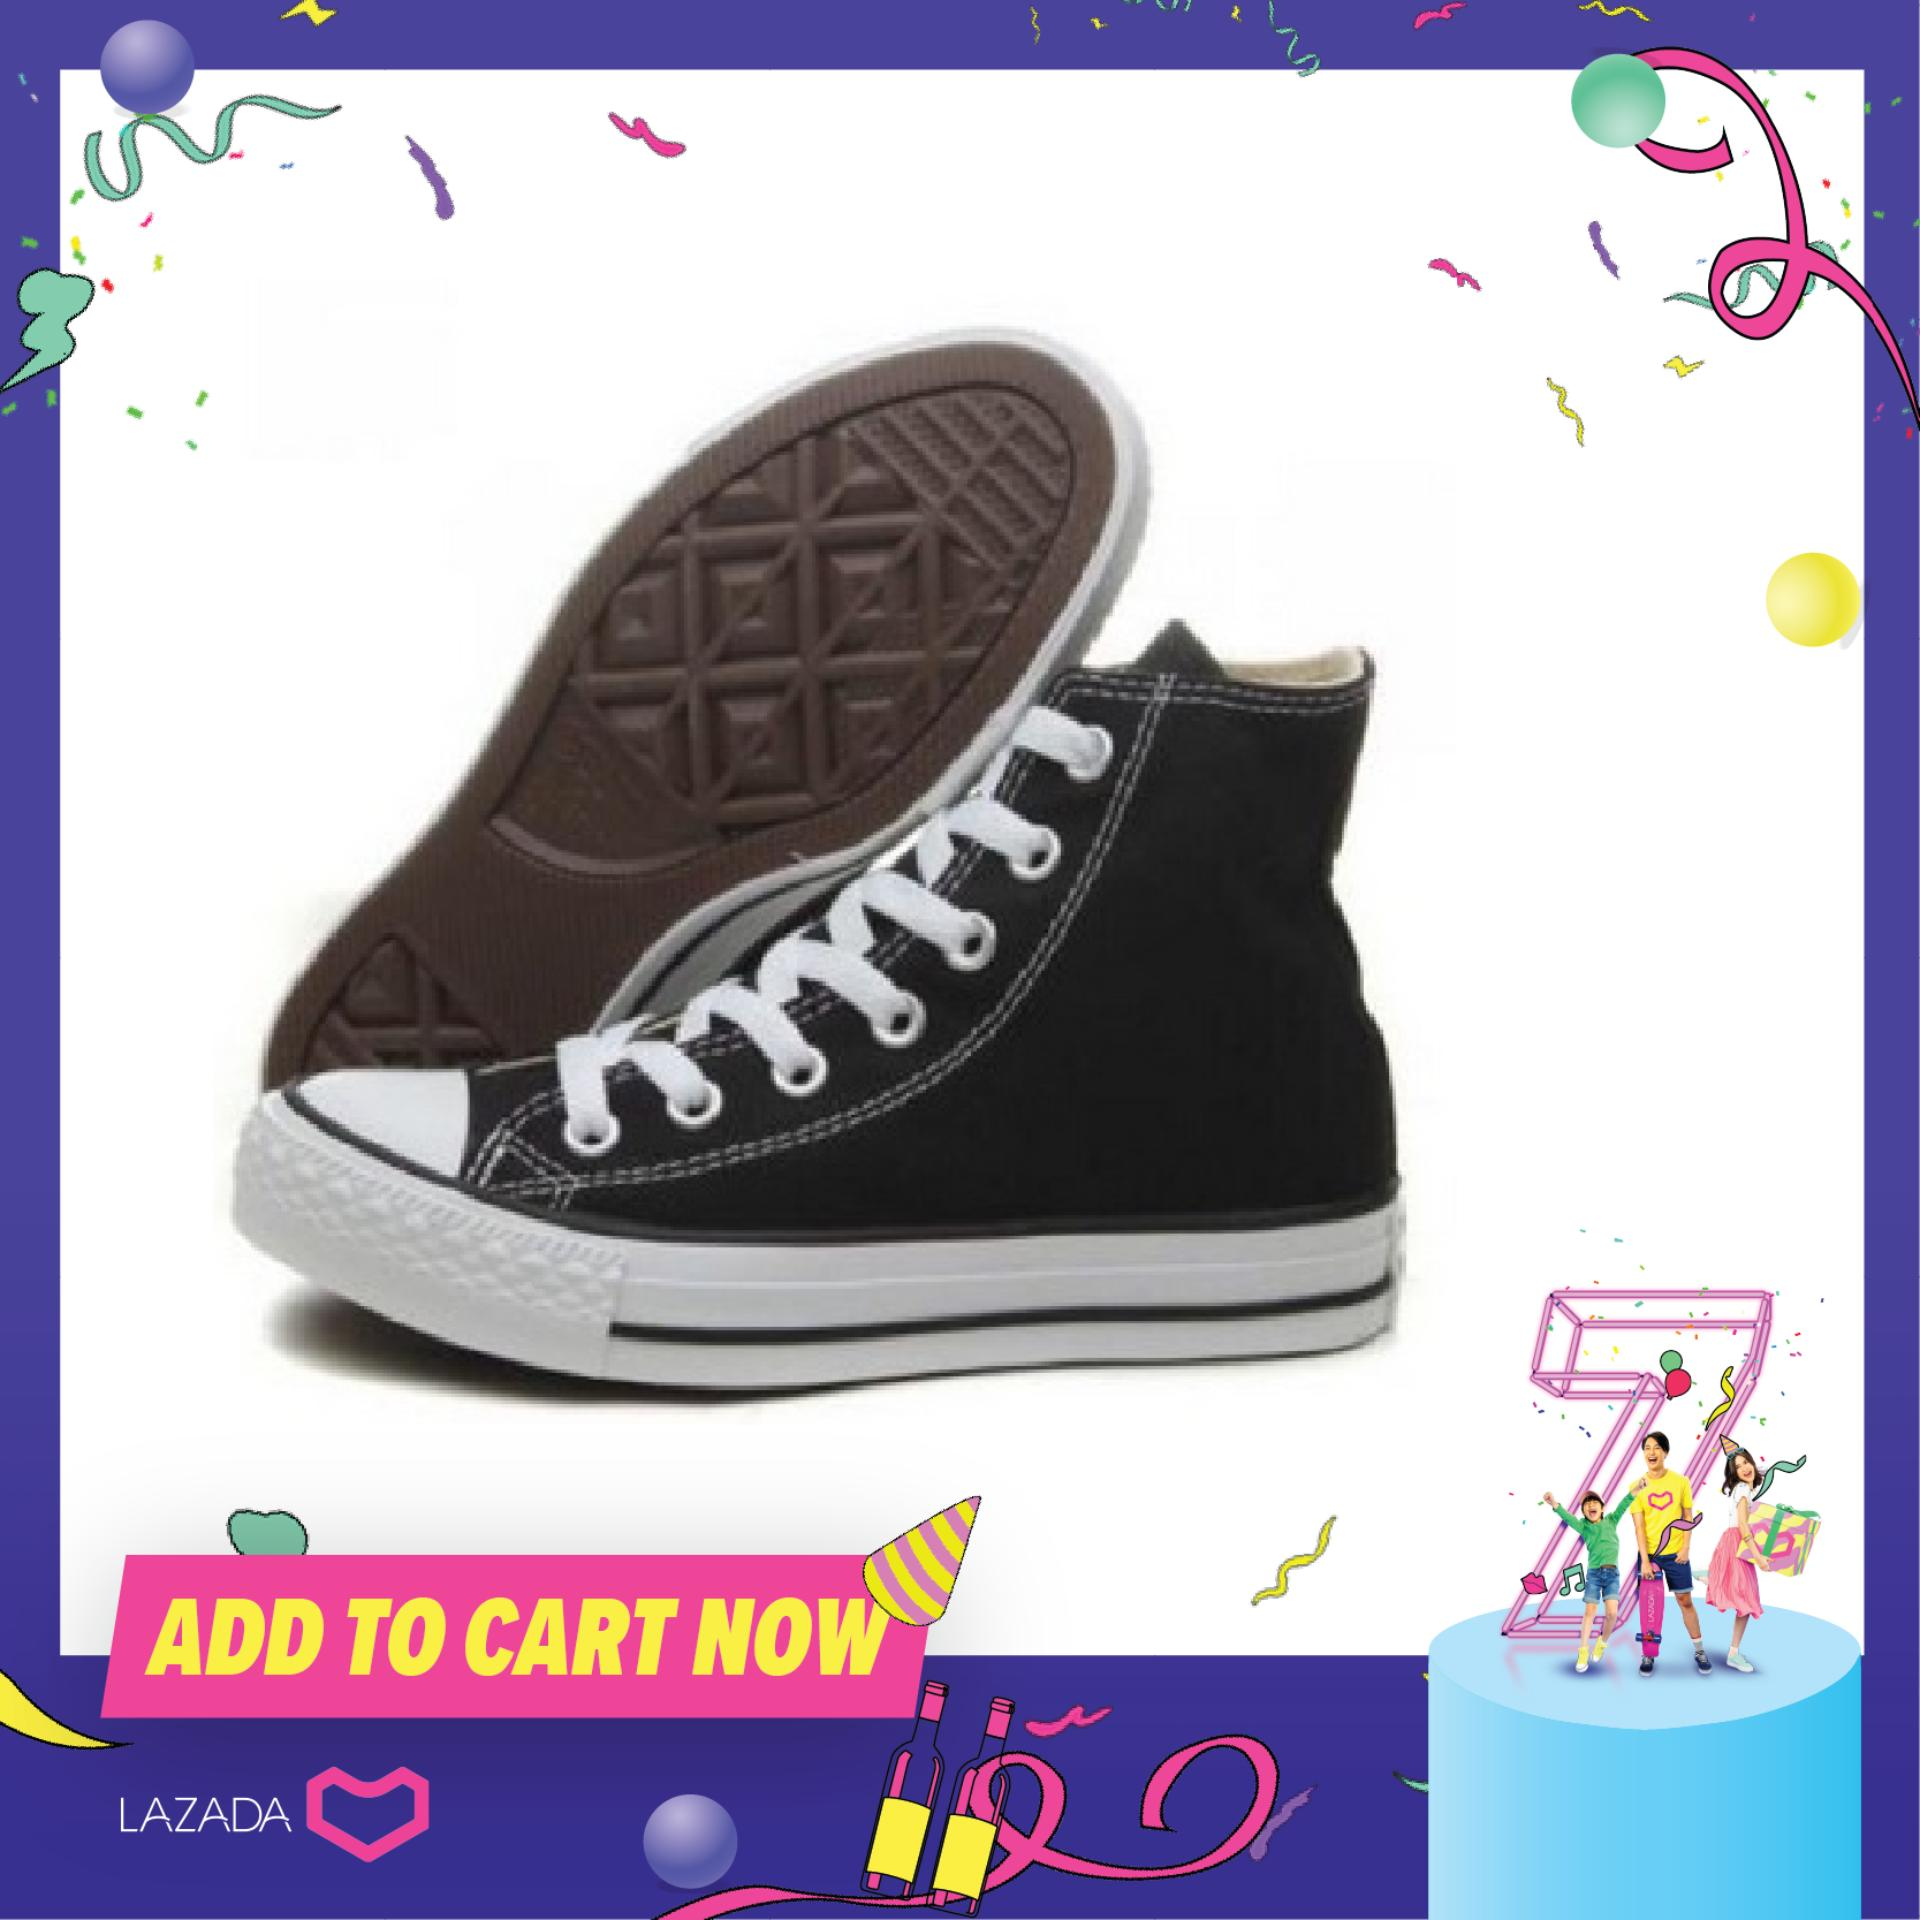 Converse Philippines  Converse price list - Shoes for Men   Women ... 53fc27863b0d1